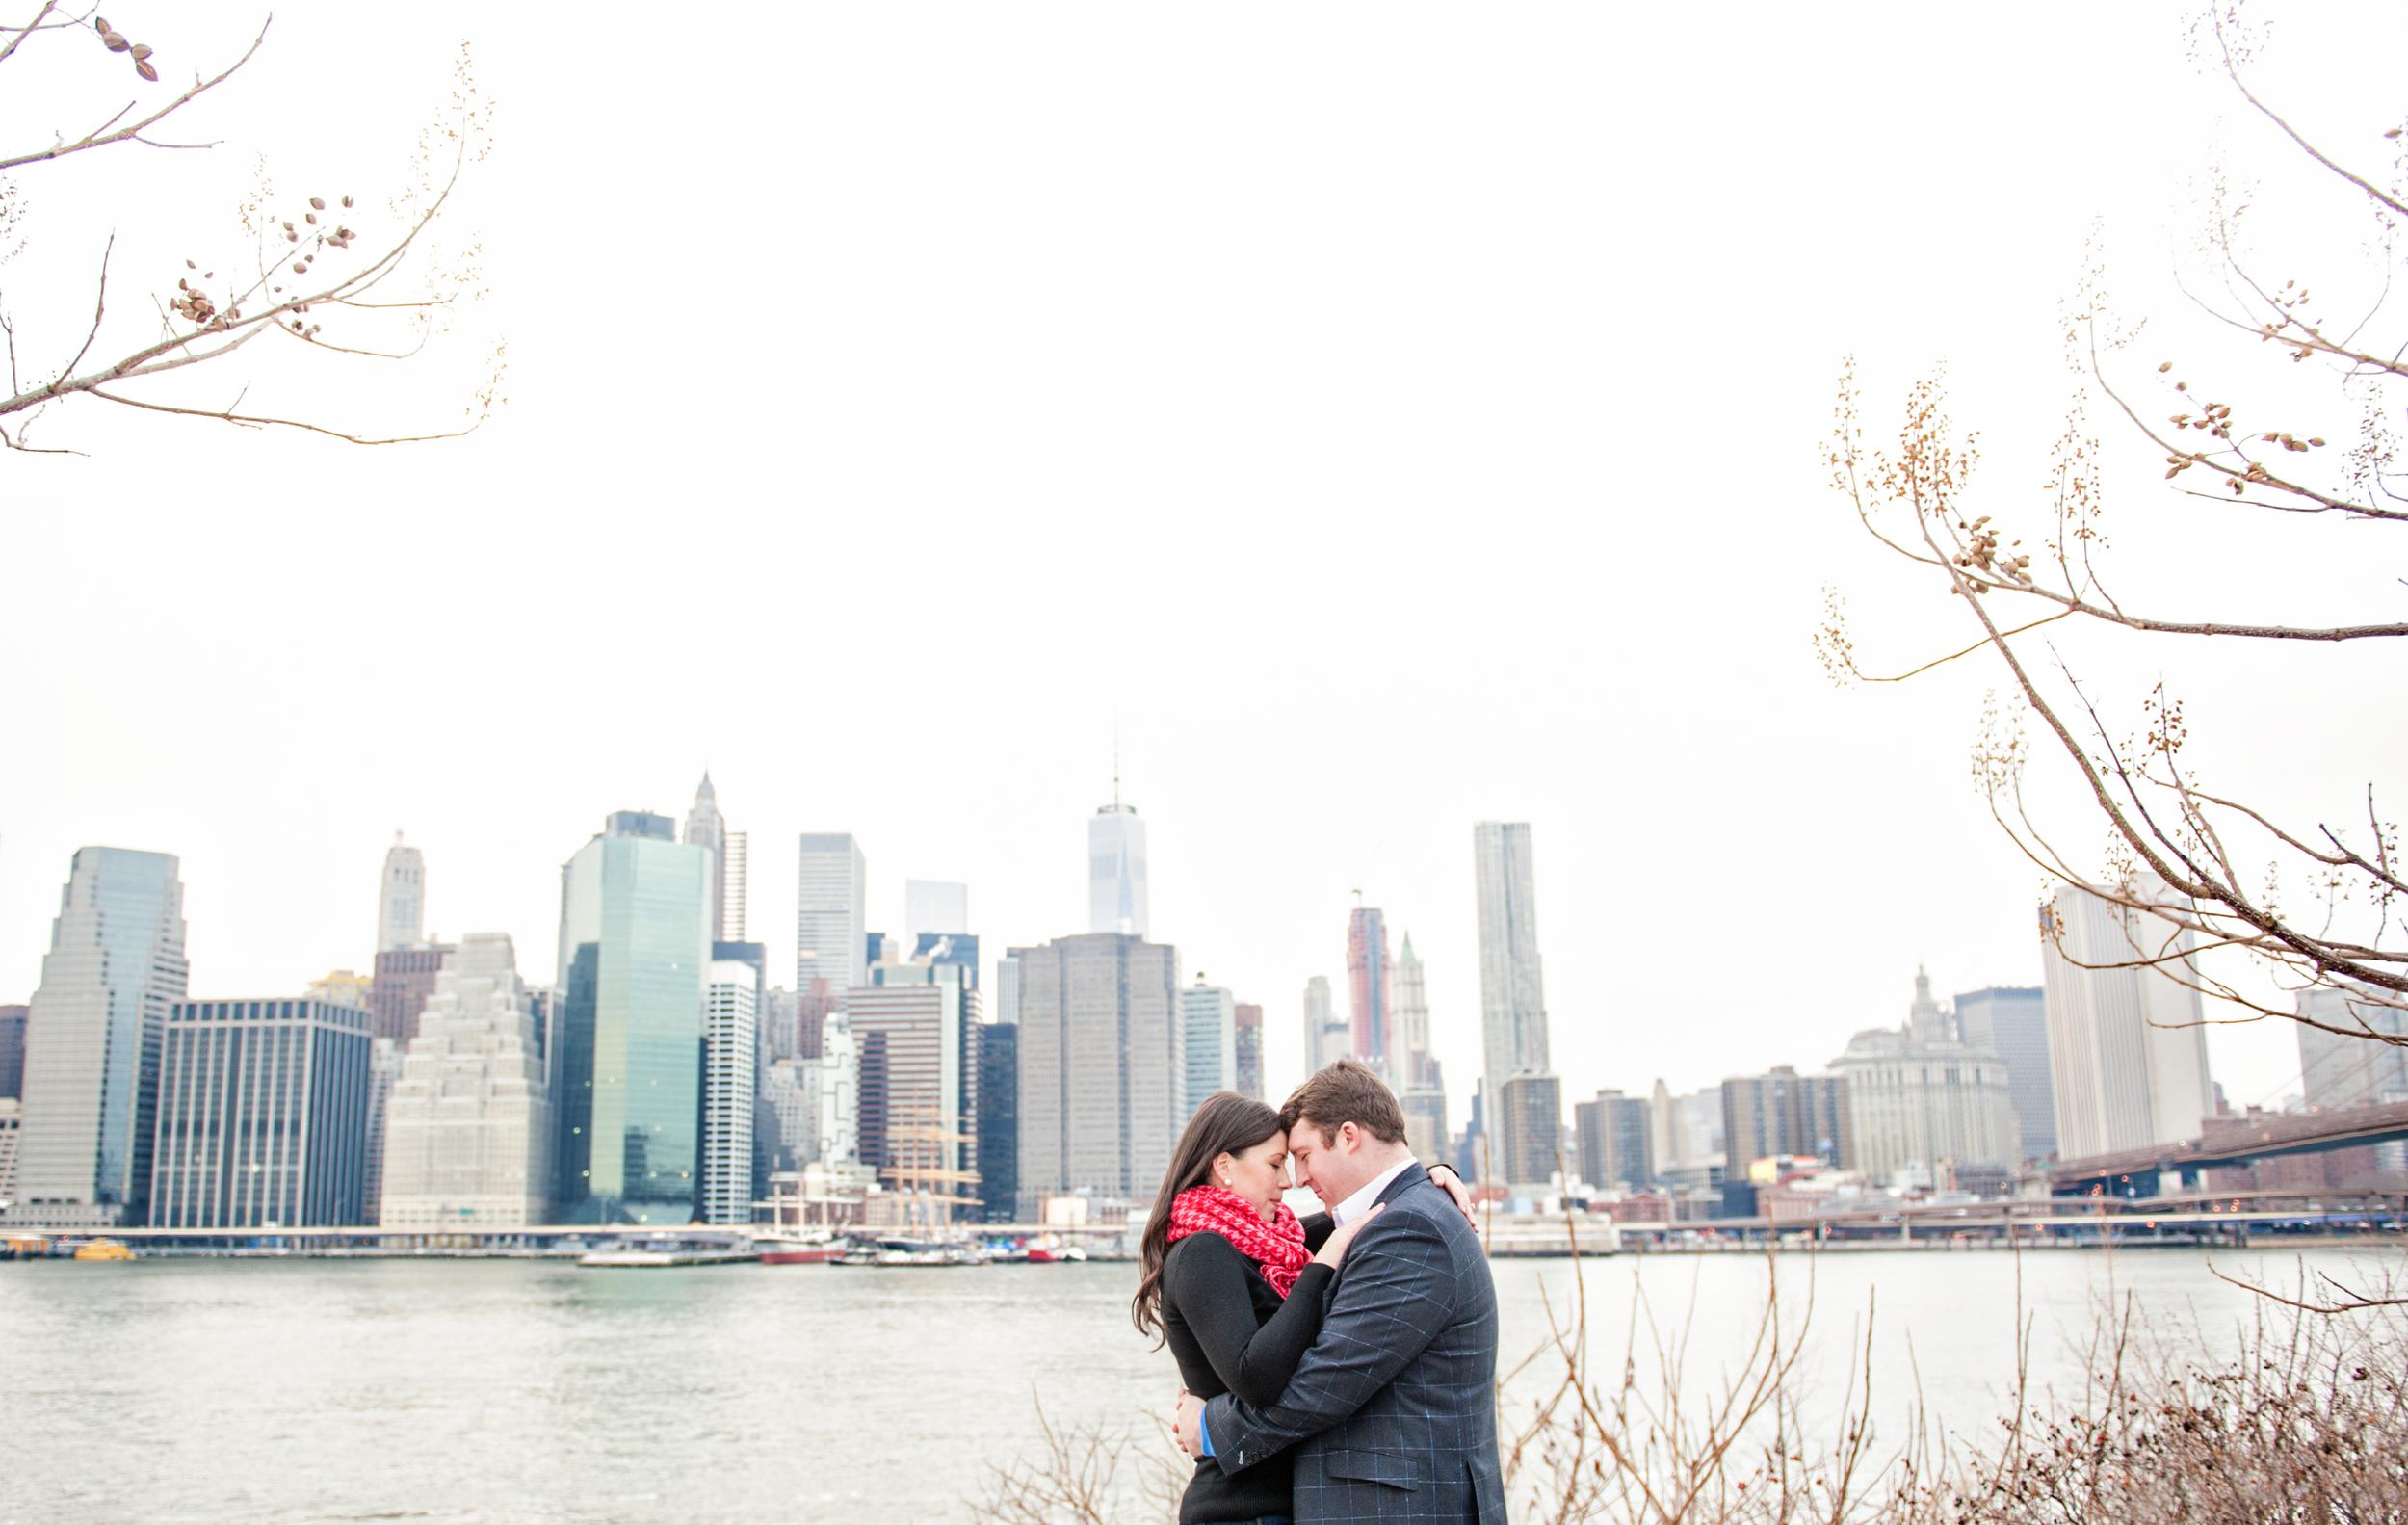 Cirella_Engagement-11.jpg